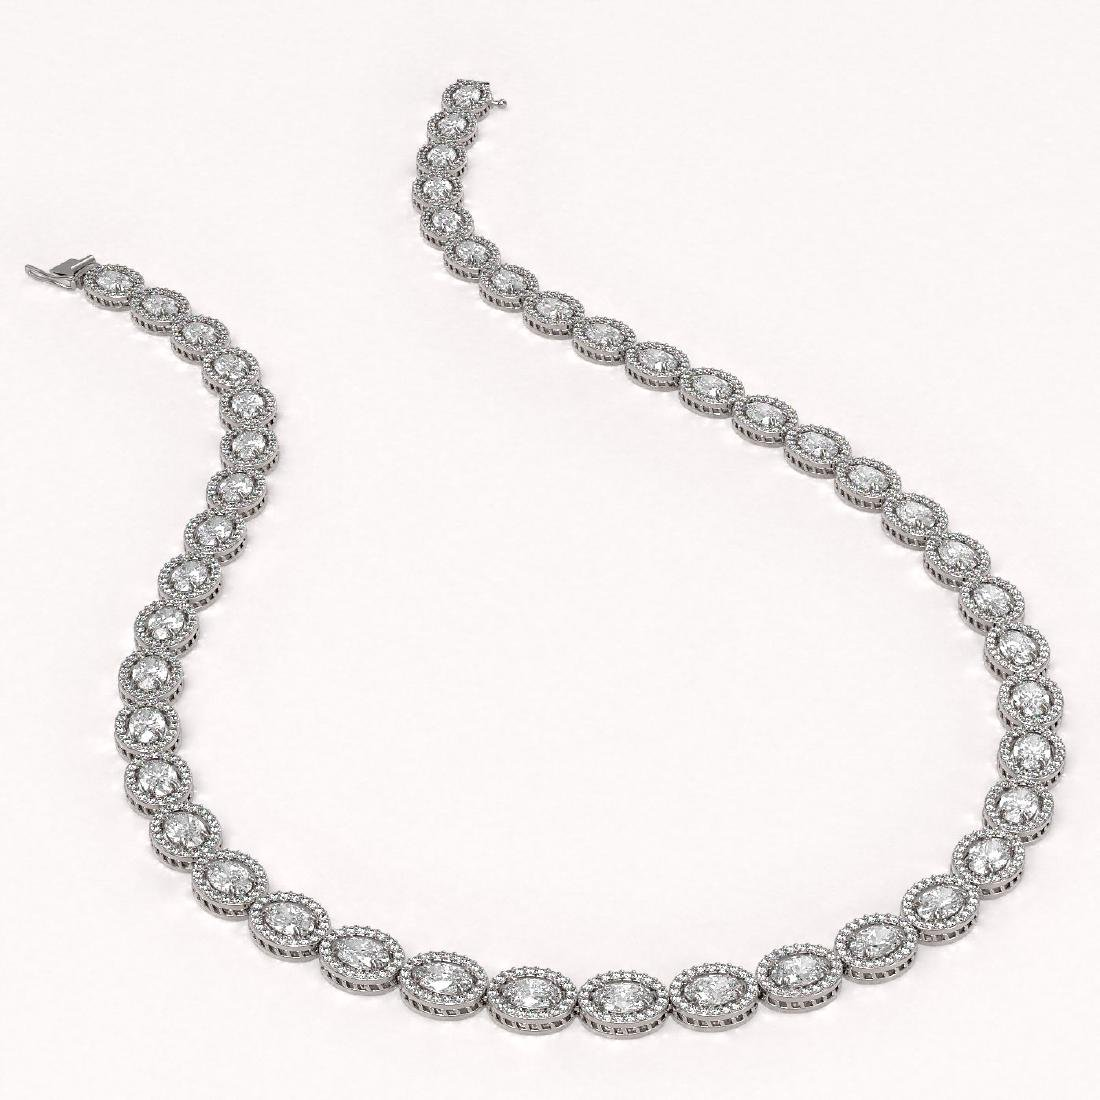 30.41 CTW Oval Diamond Designer Necklace 18K White Gold - 2